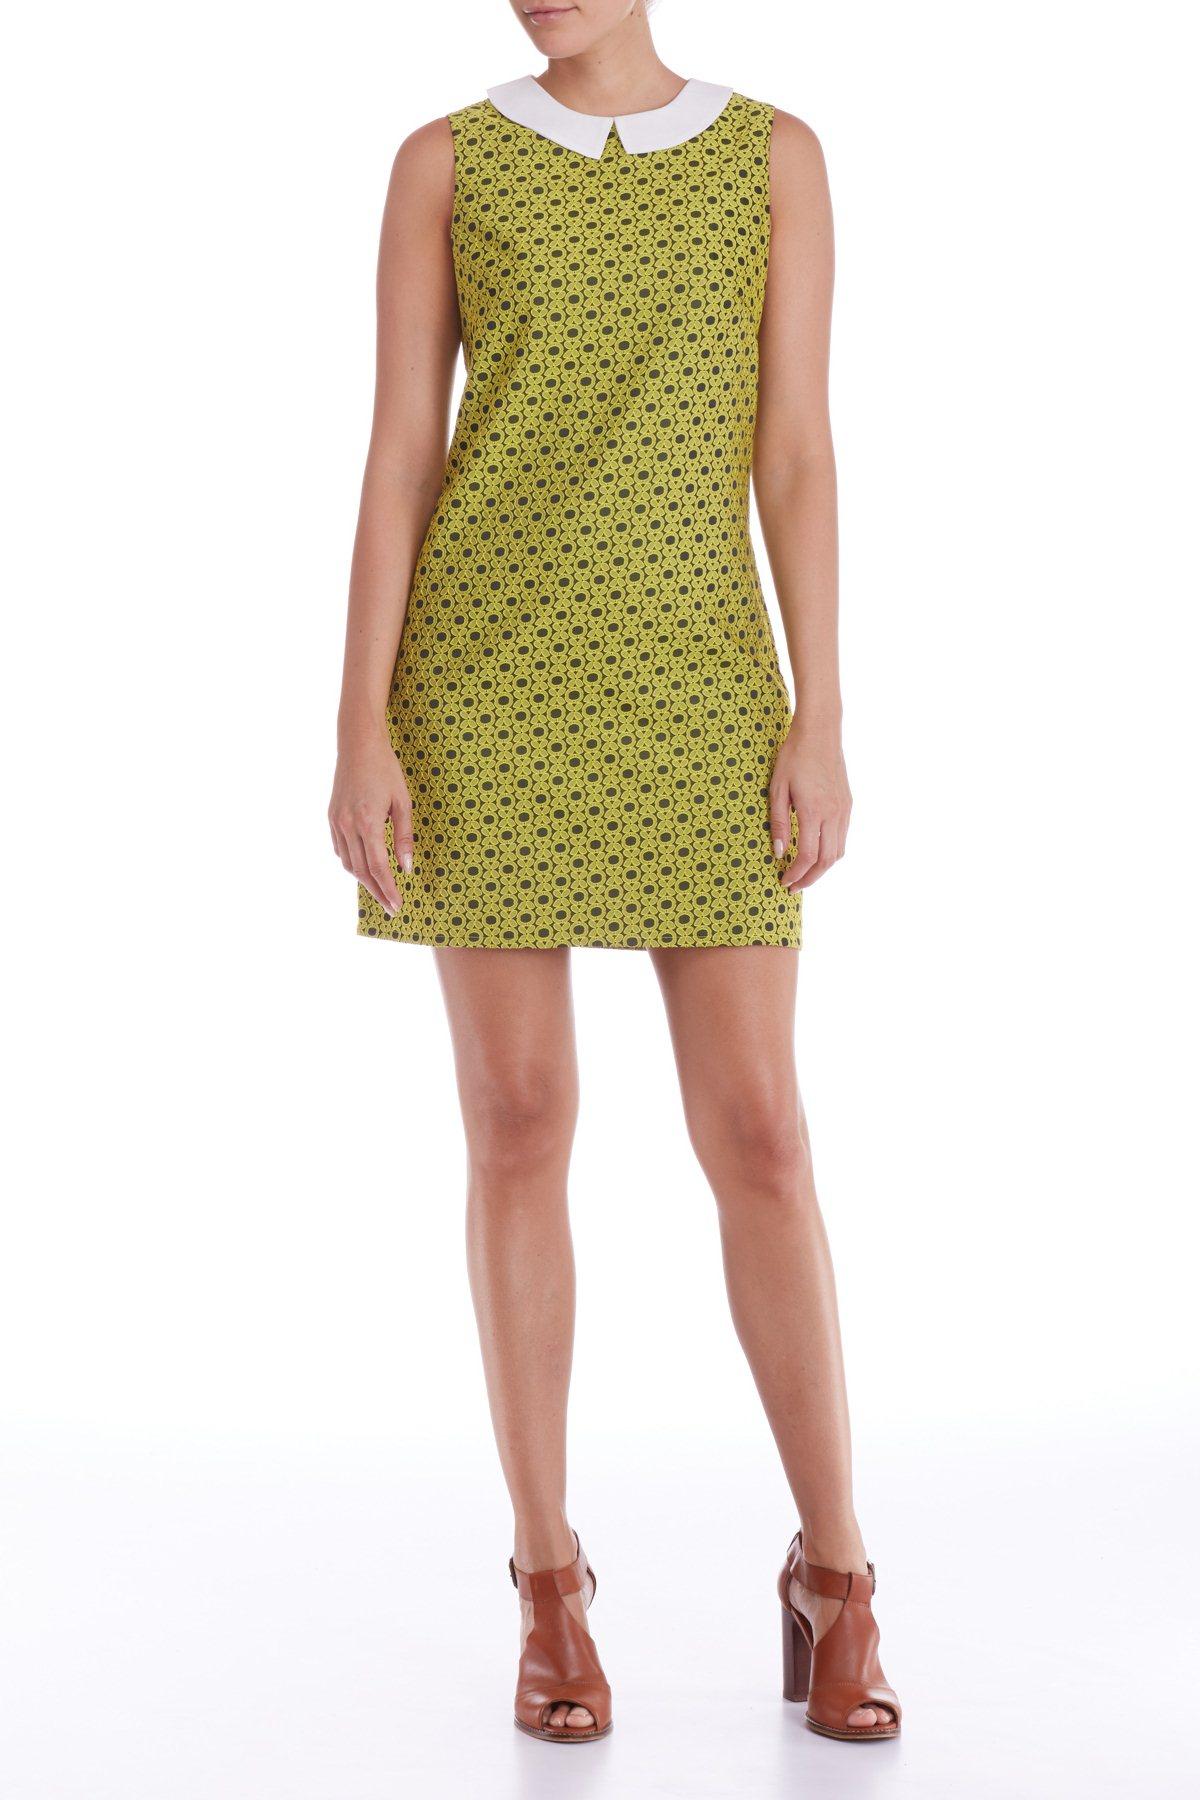 AW14 Chloe Dress - Sugarhill Boutique